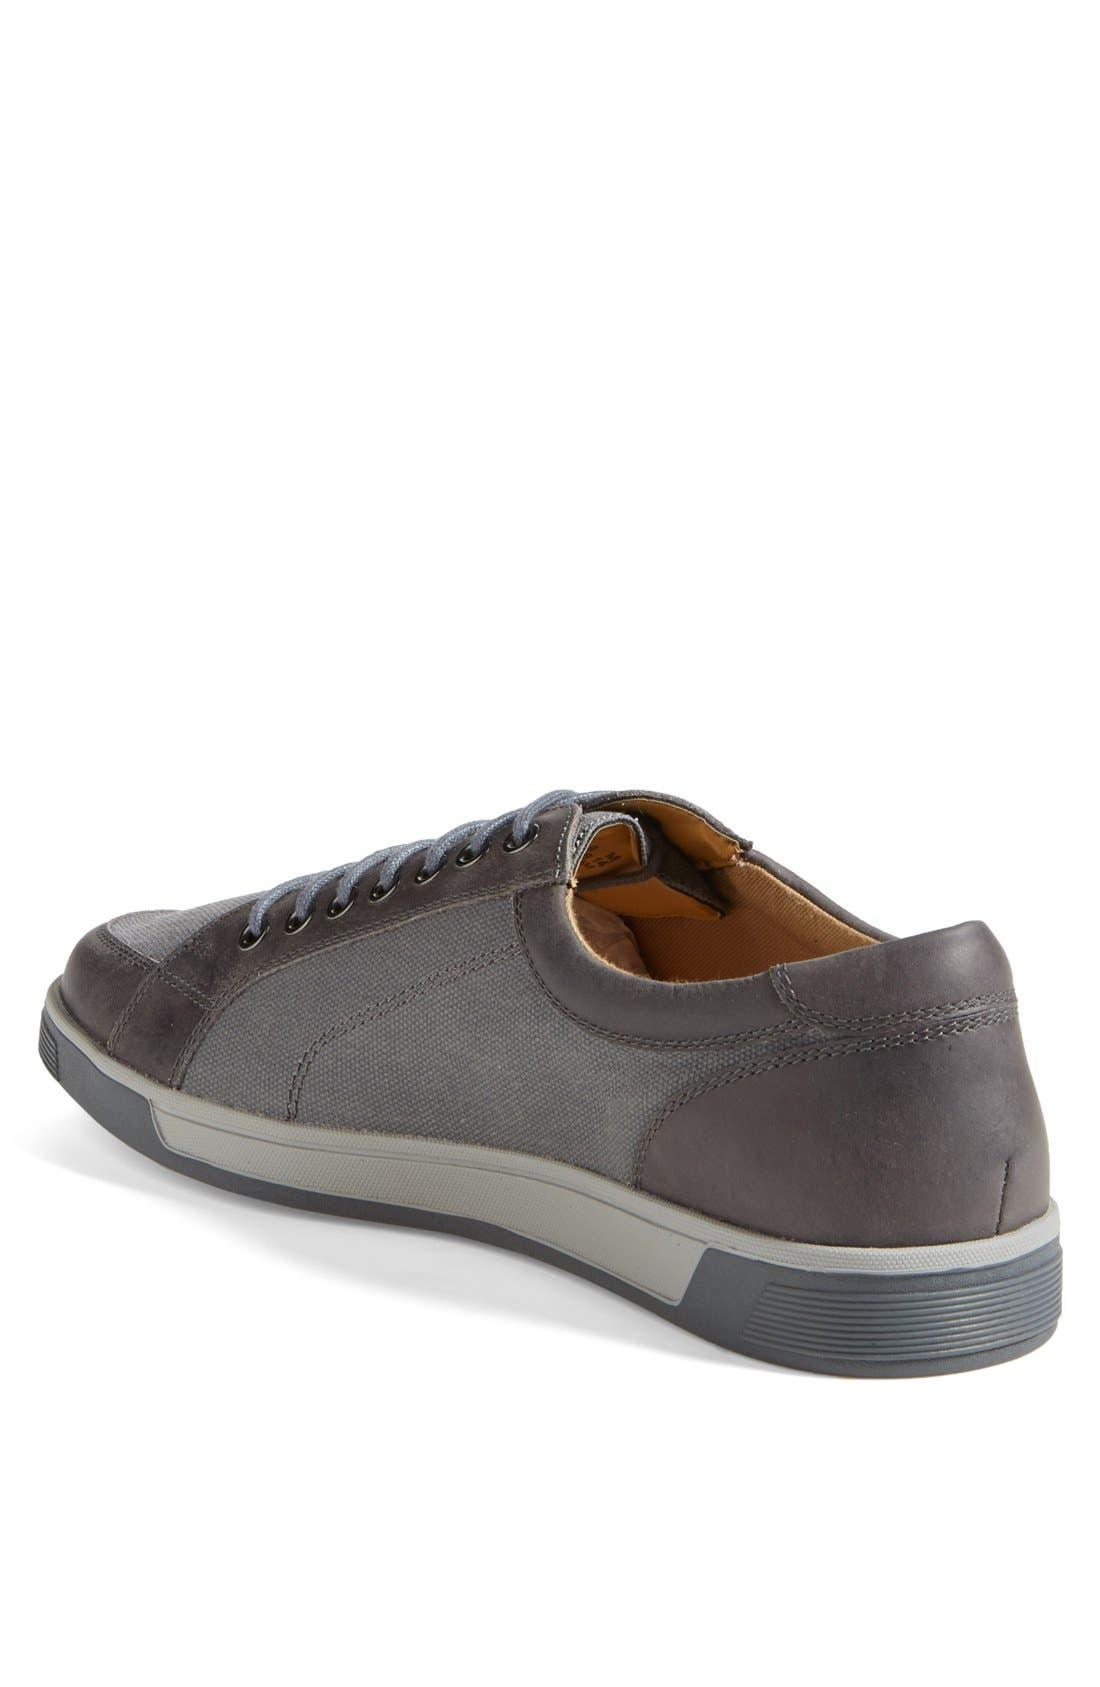 'Vartan Sport Oxford' Sneaker,                             Alternate thumbnail 63, color,